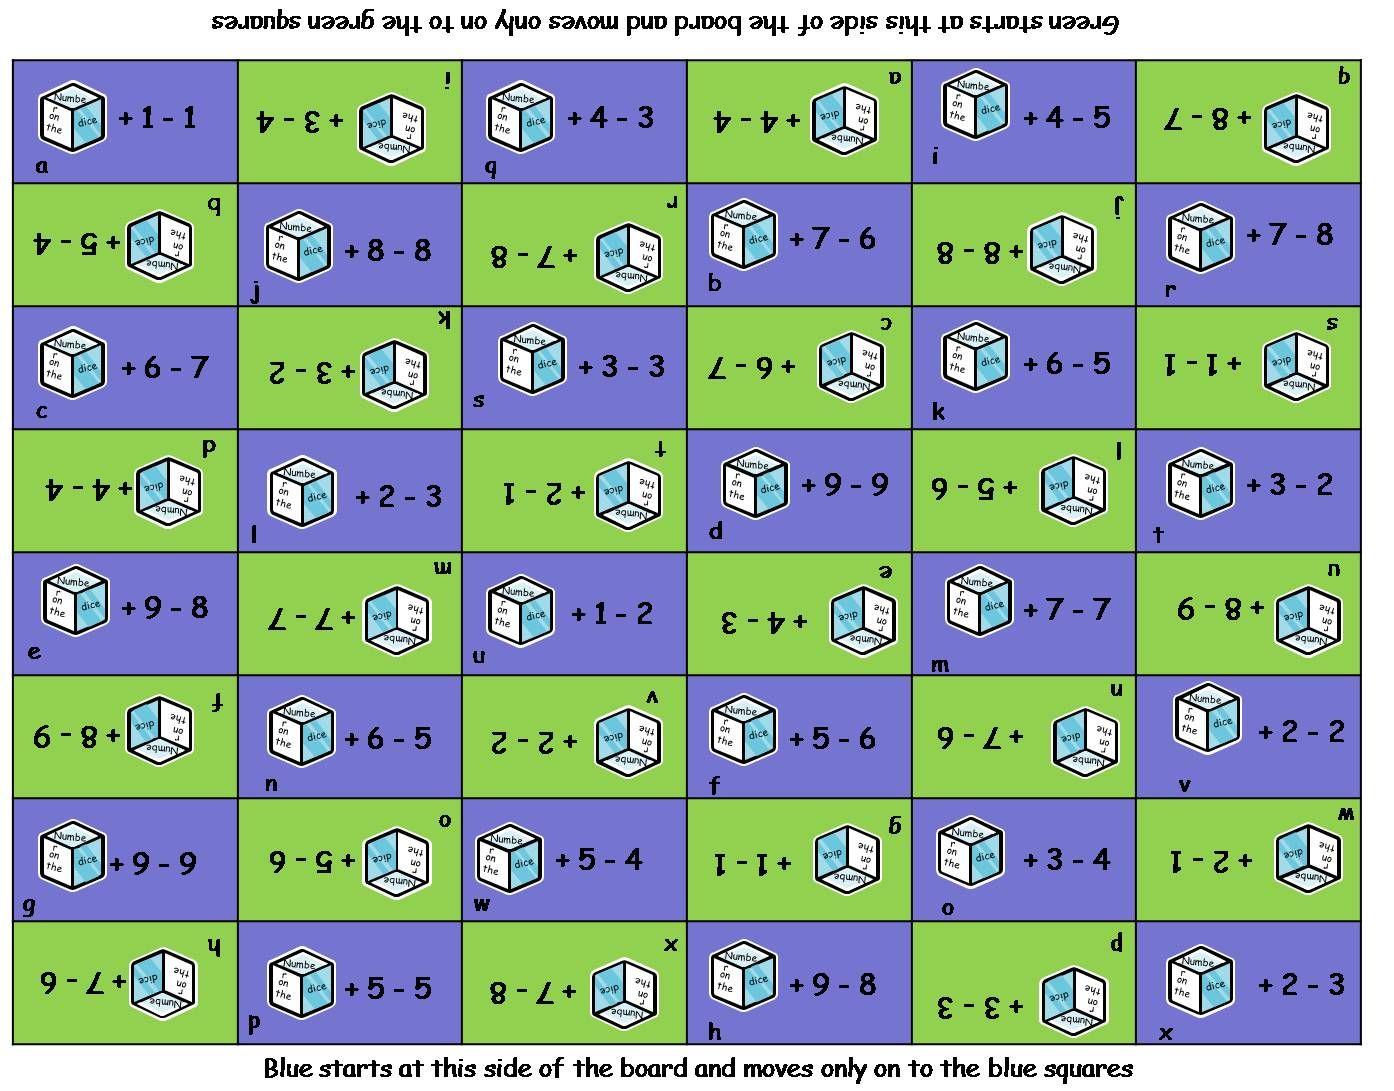 alien board game printable - Google Search   Math   Pinterest   Math